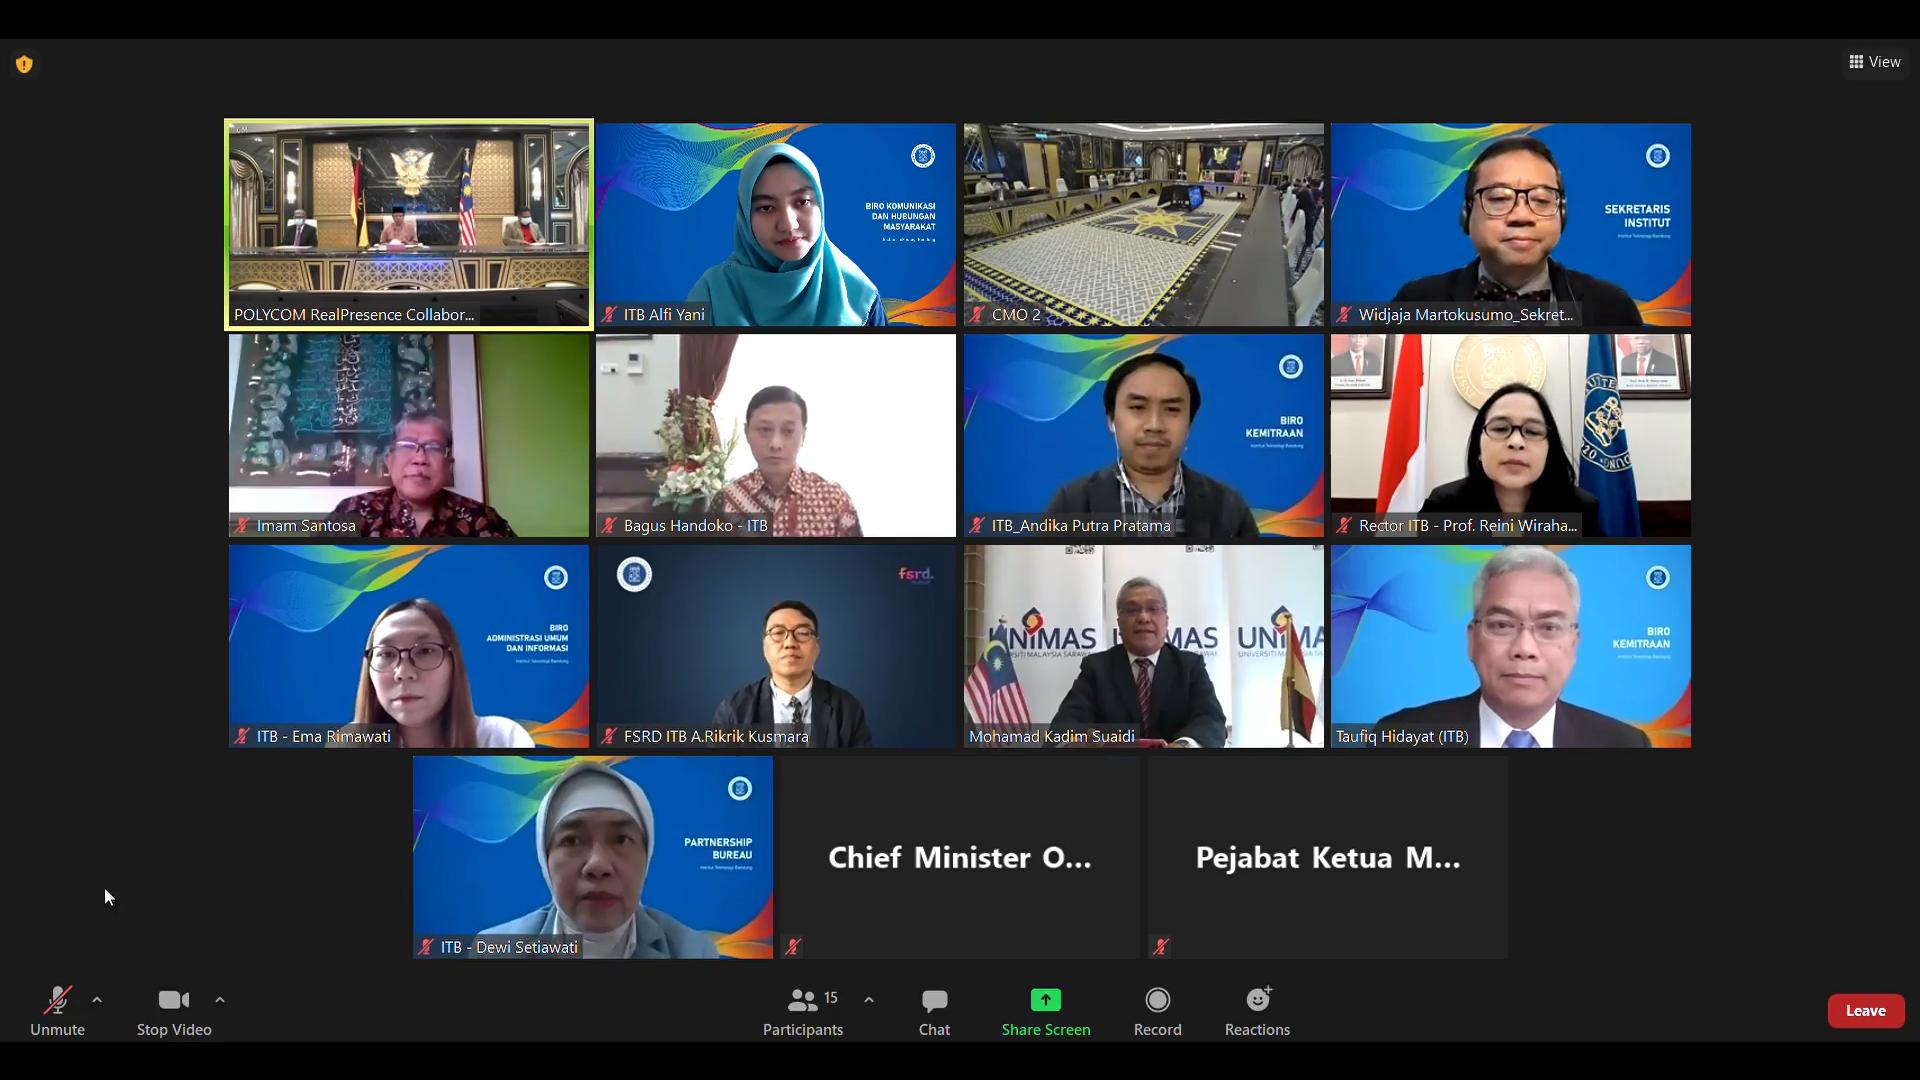 itb-jalin-mou-di-bidang-pendidikanpengajaran-dan-penelitian-dengan-unimas-malaysia